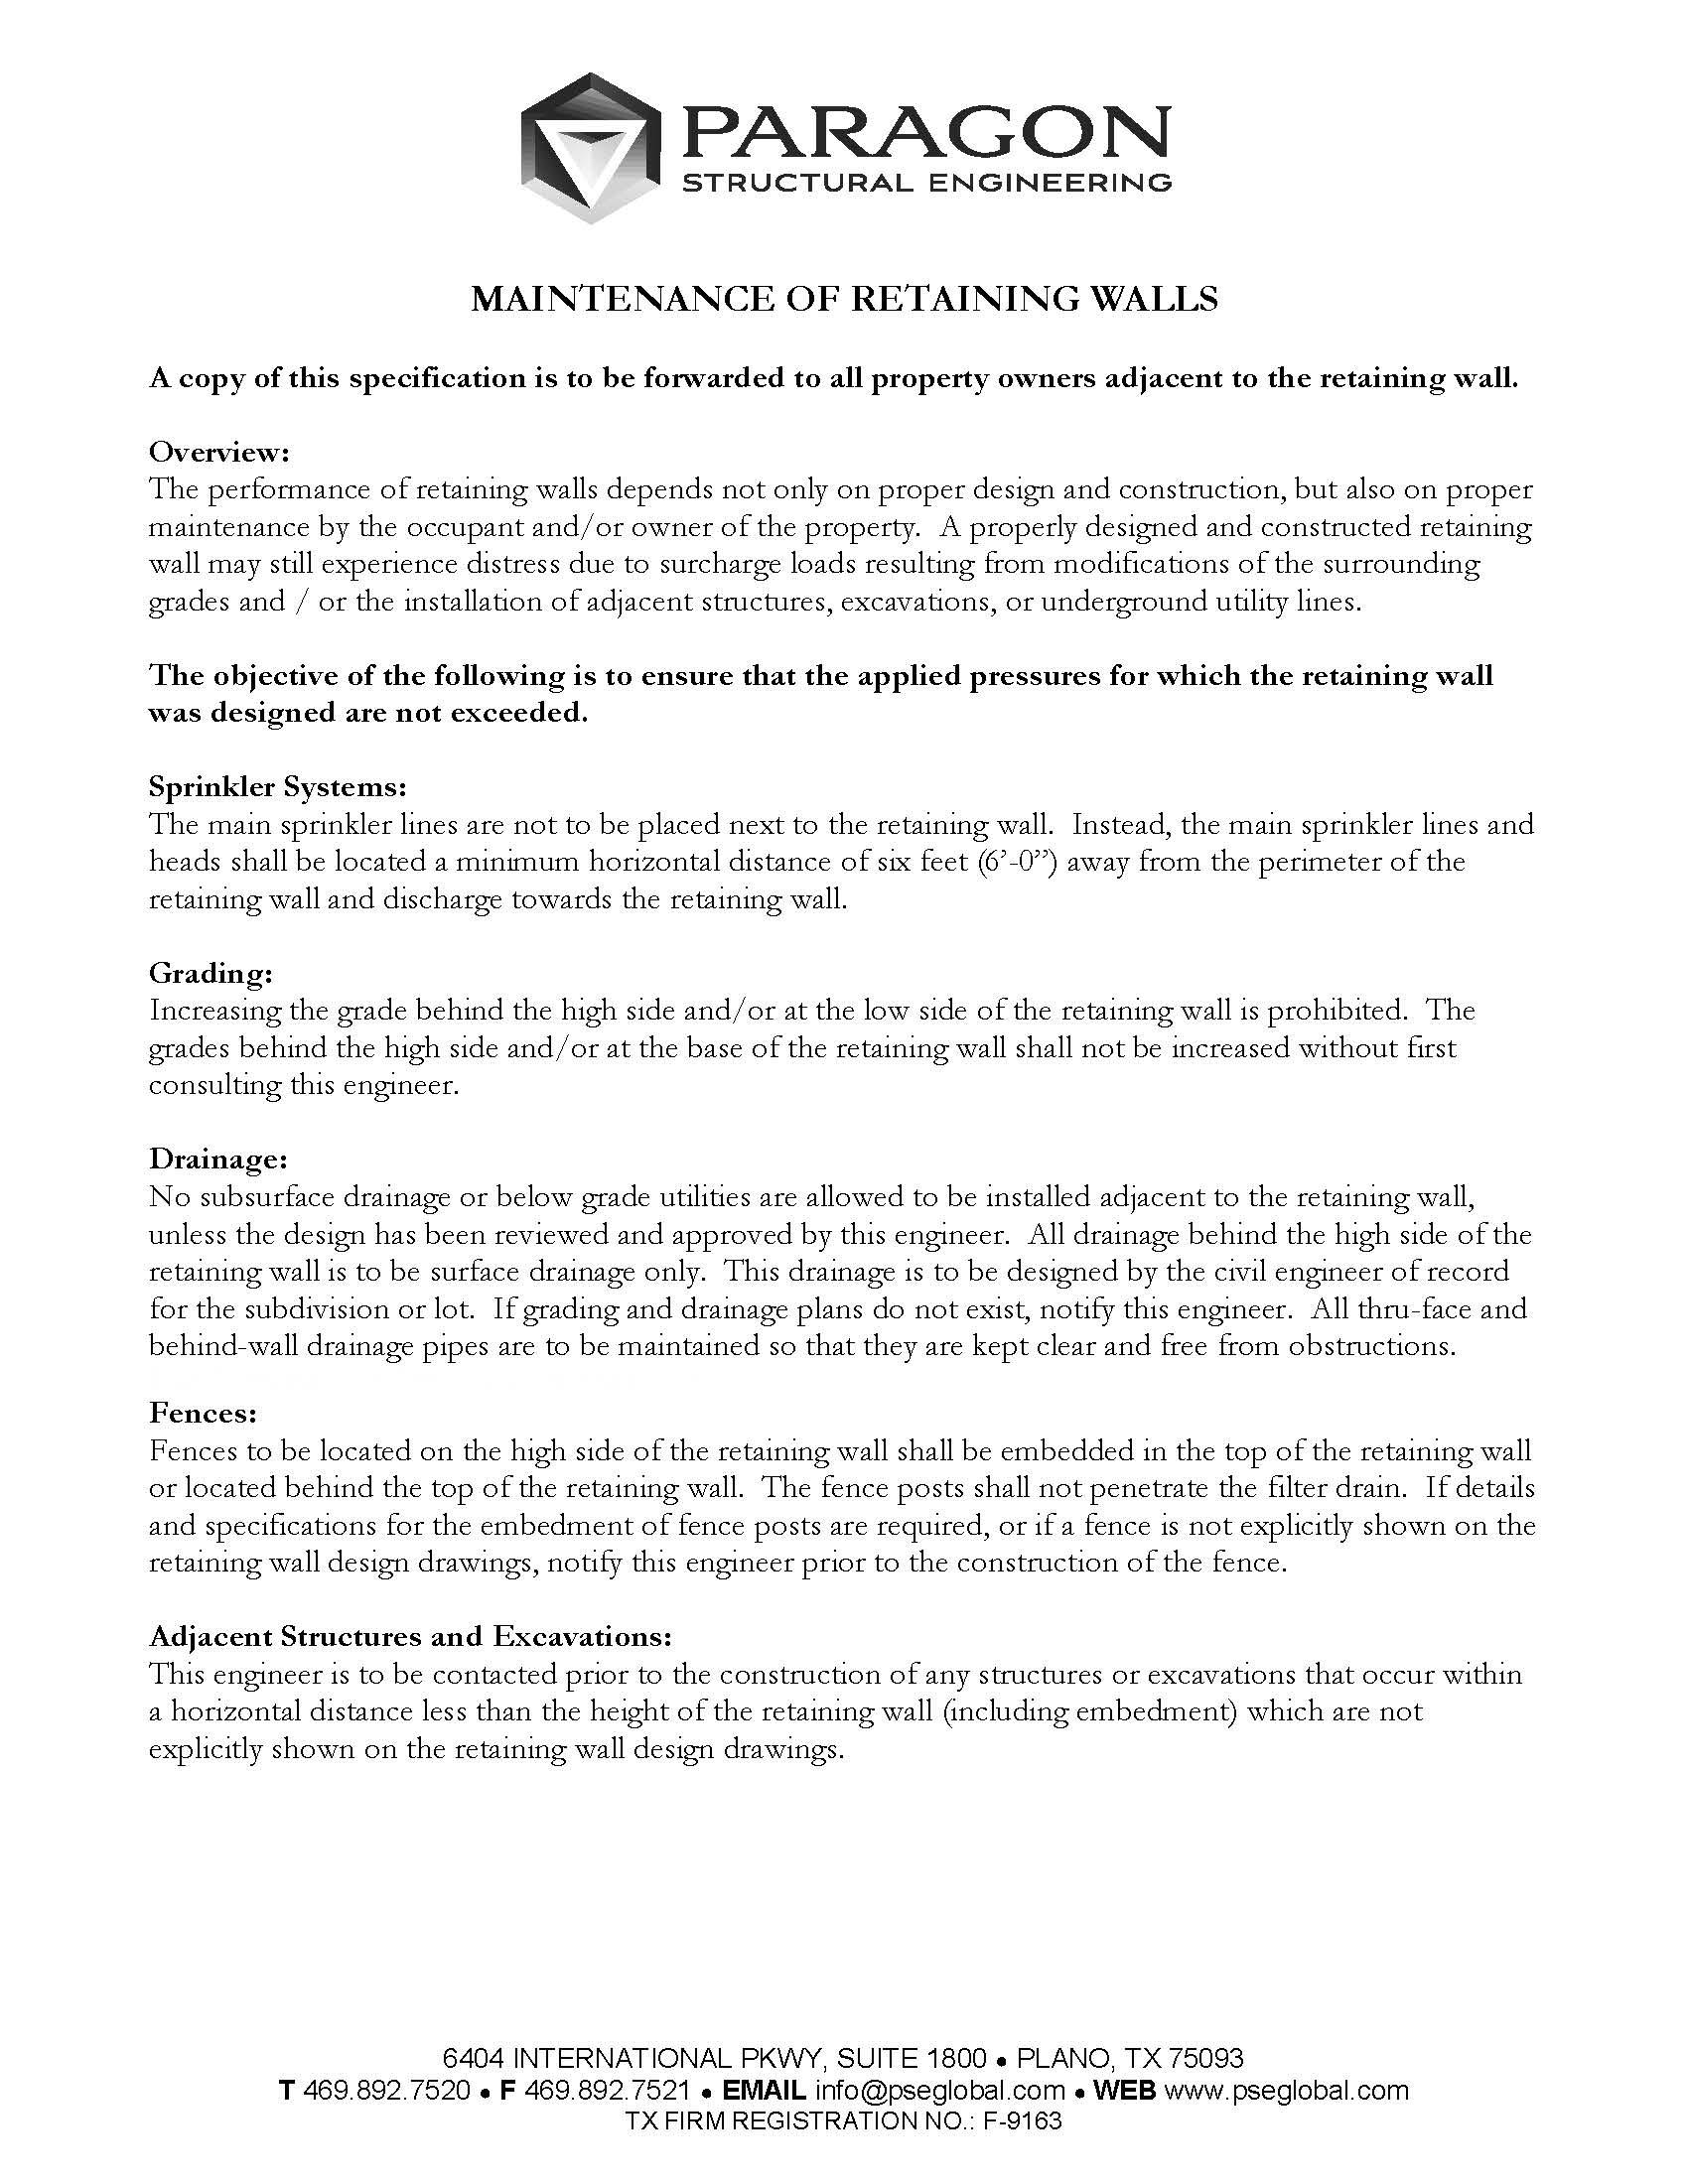 maintenance-retaining-walls – Paragon Structural Engineering